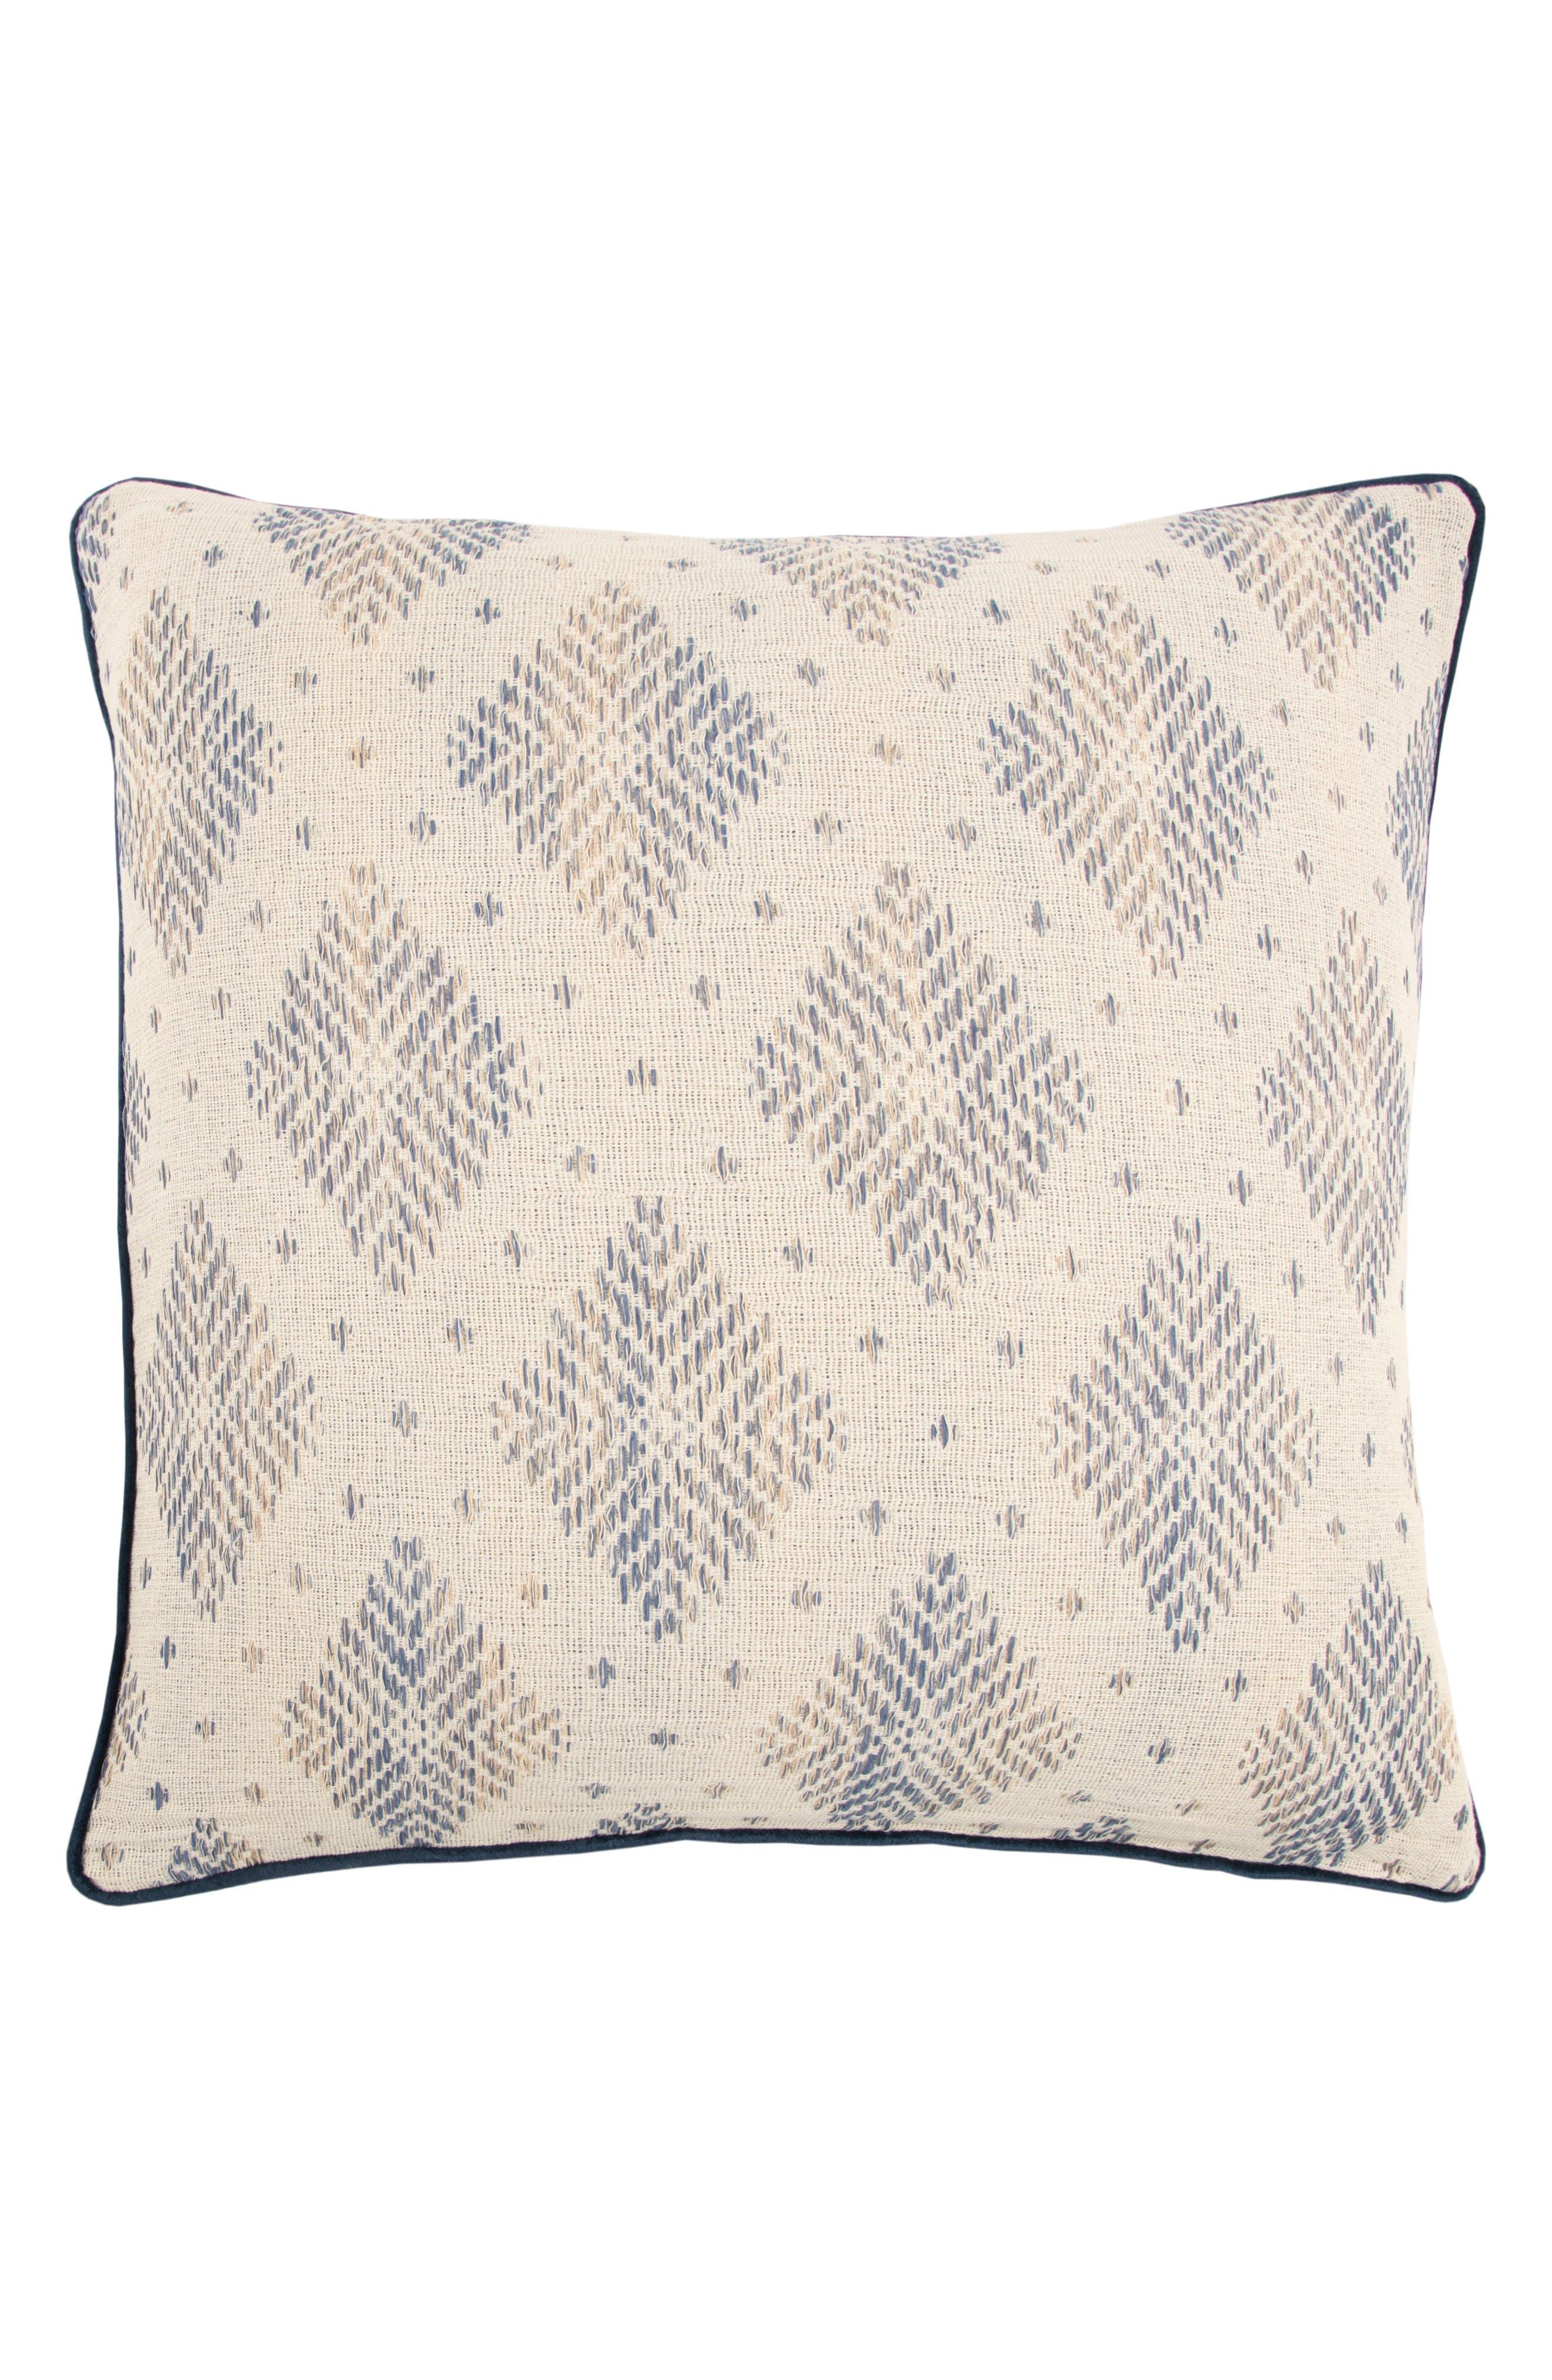 Woven Diamond Accent Pillow,                         Main,                         color,